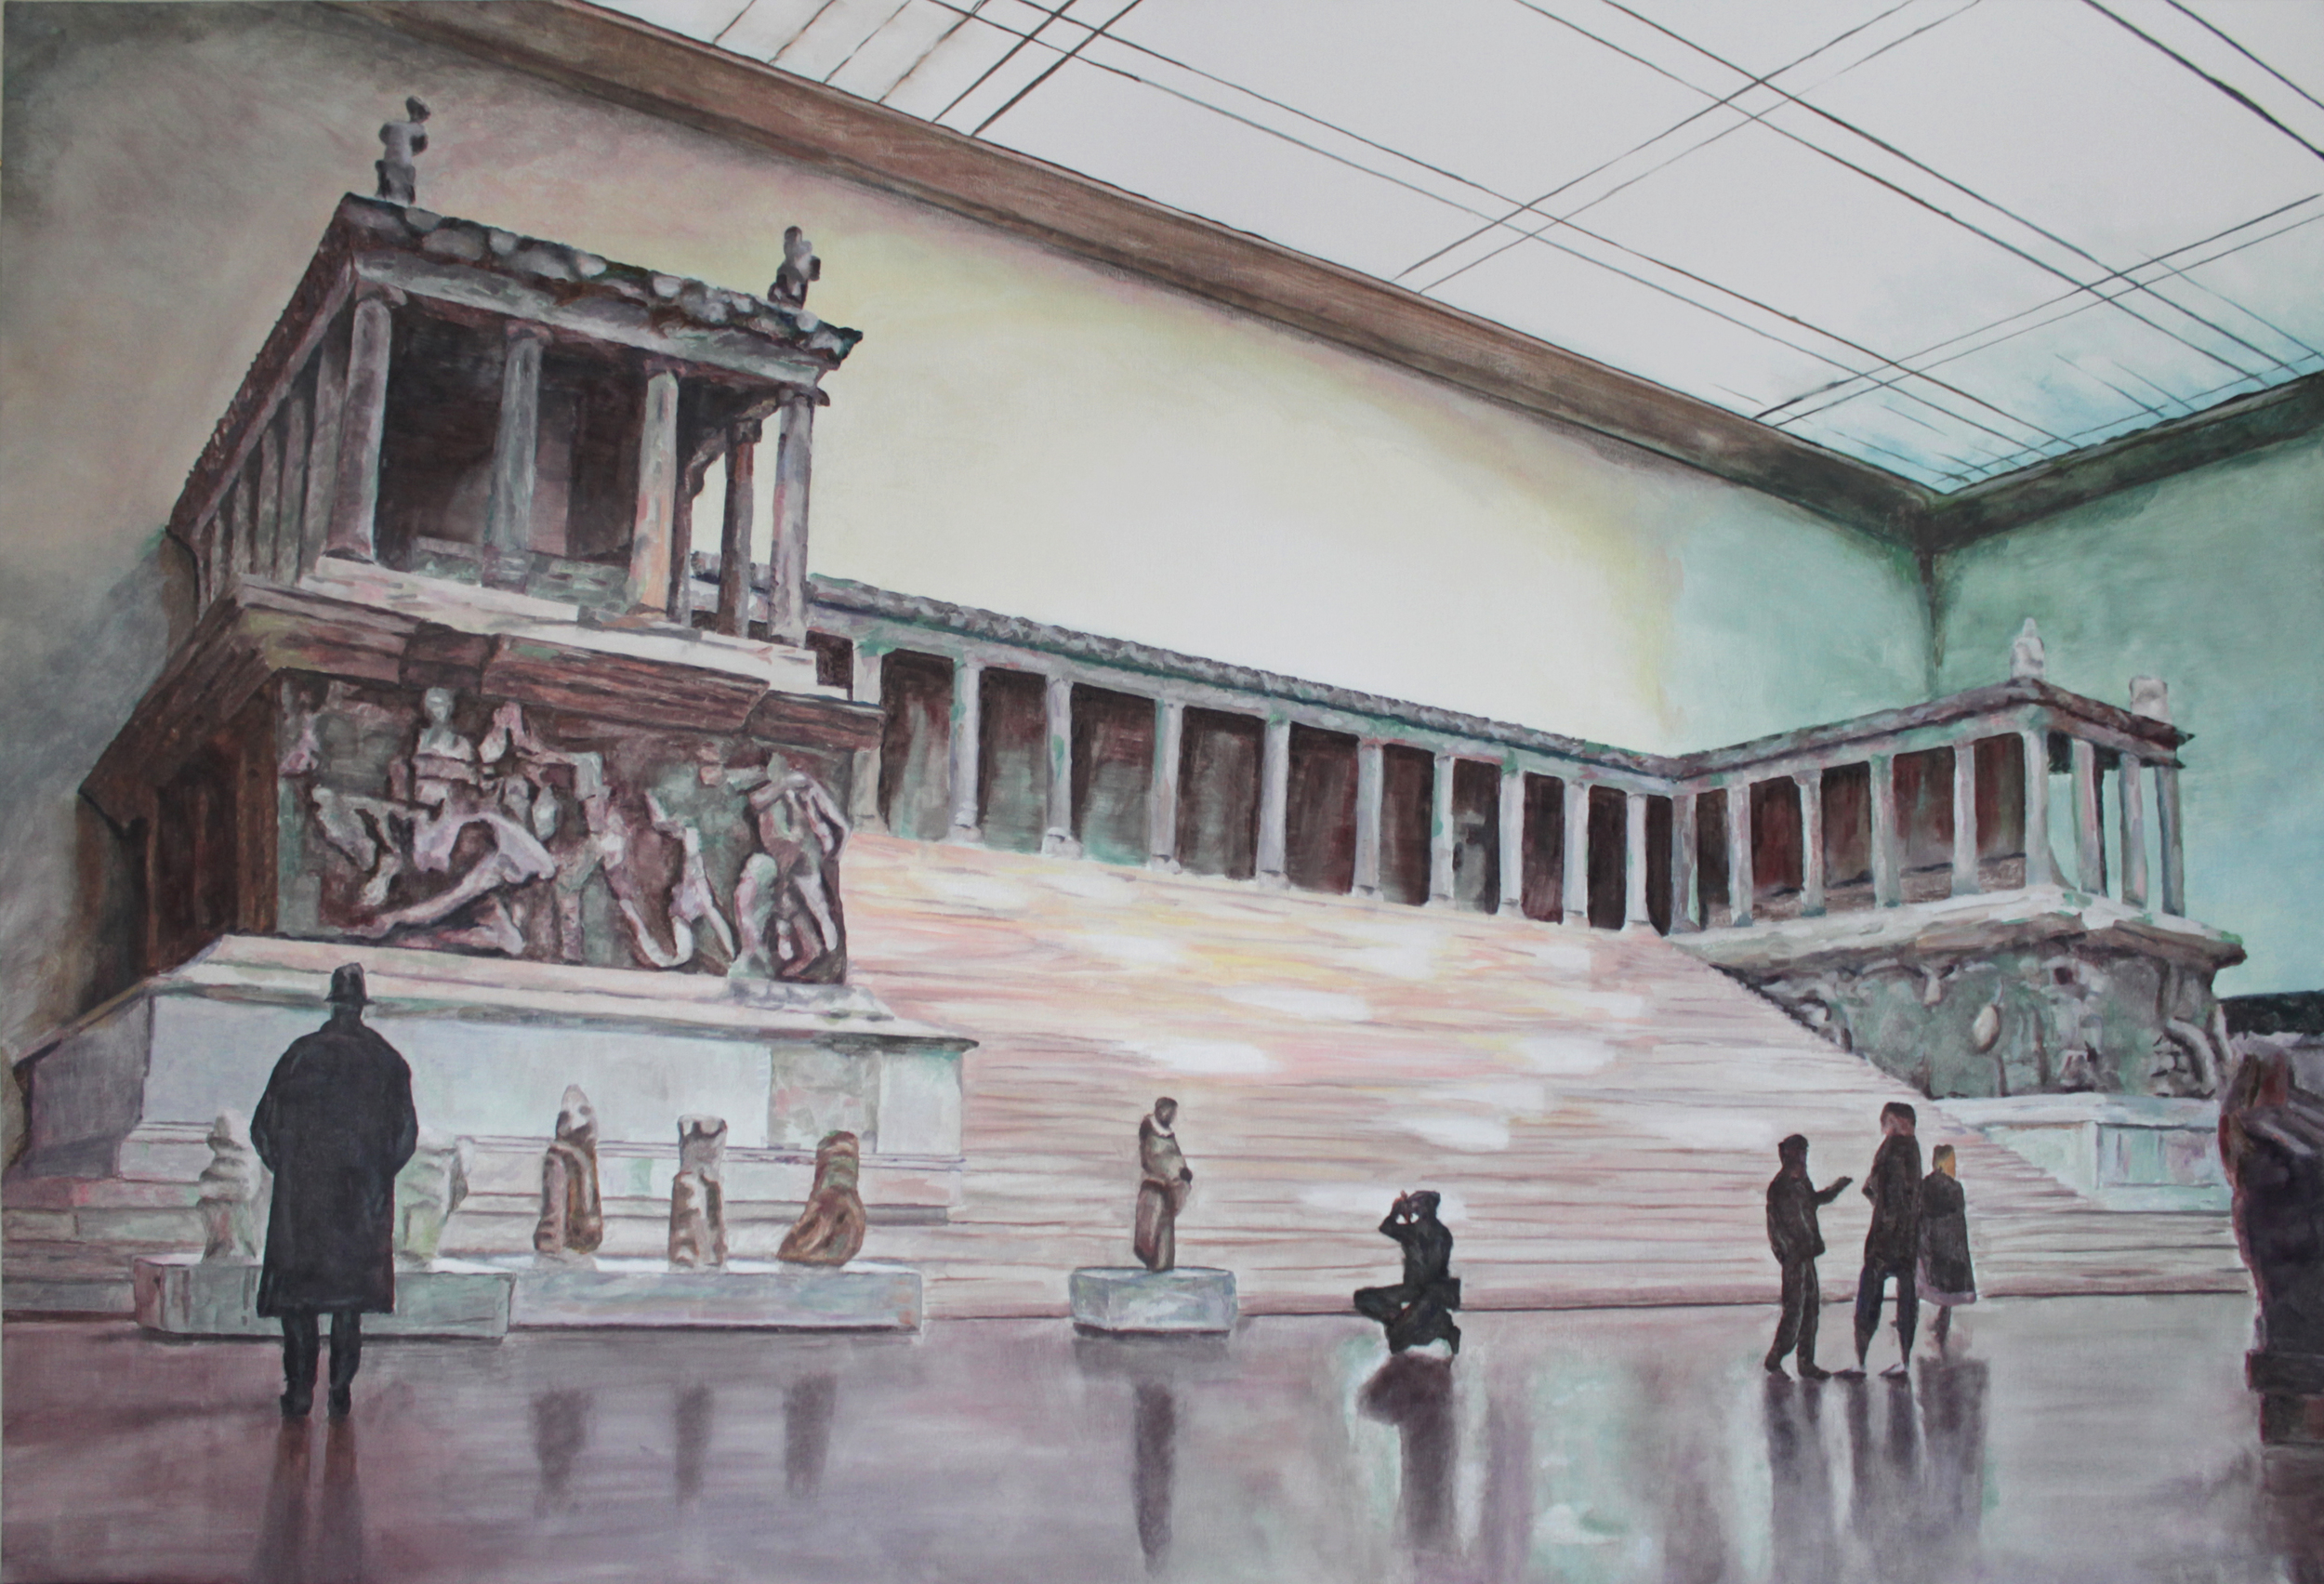 The Pergamon 2015 oil on canvas 38 x 56 in.